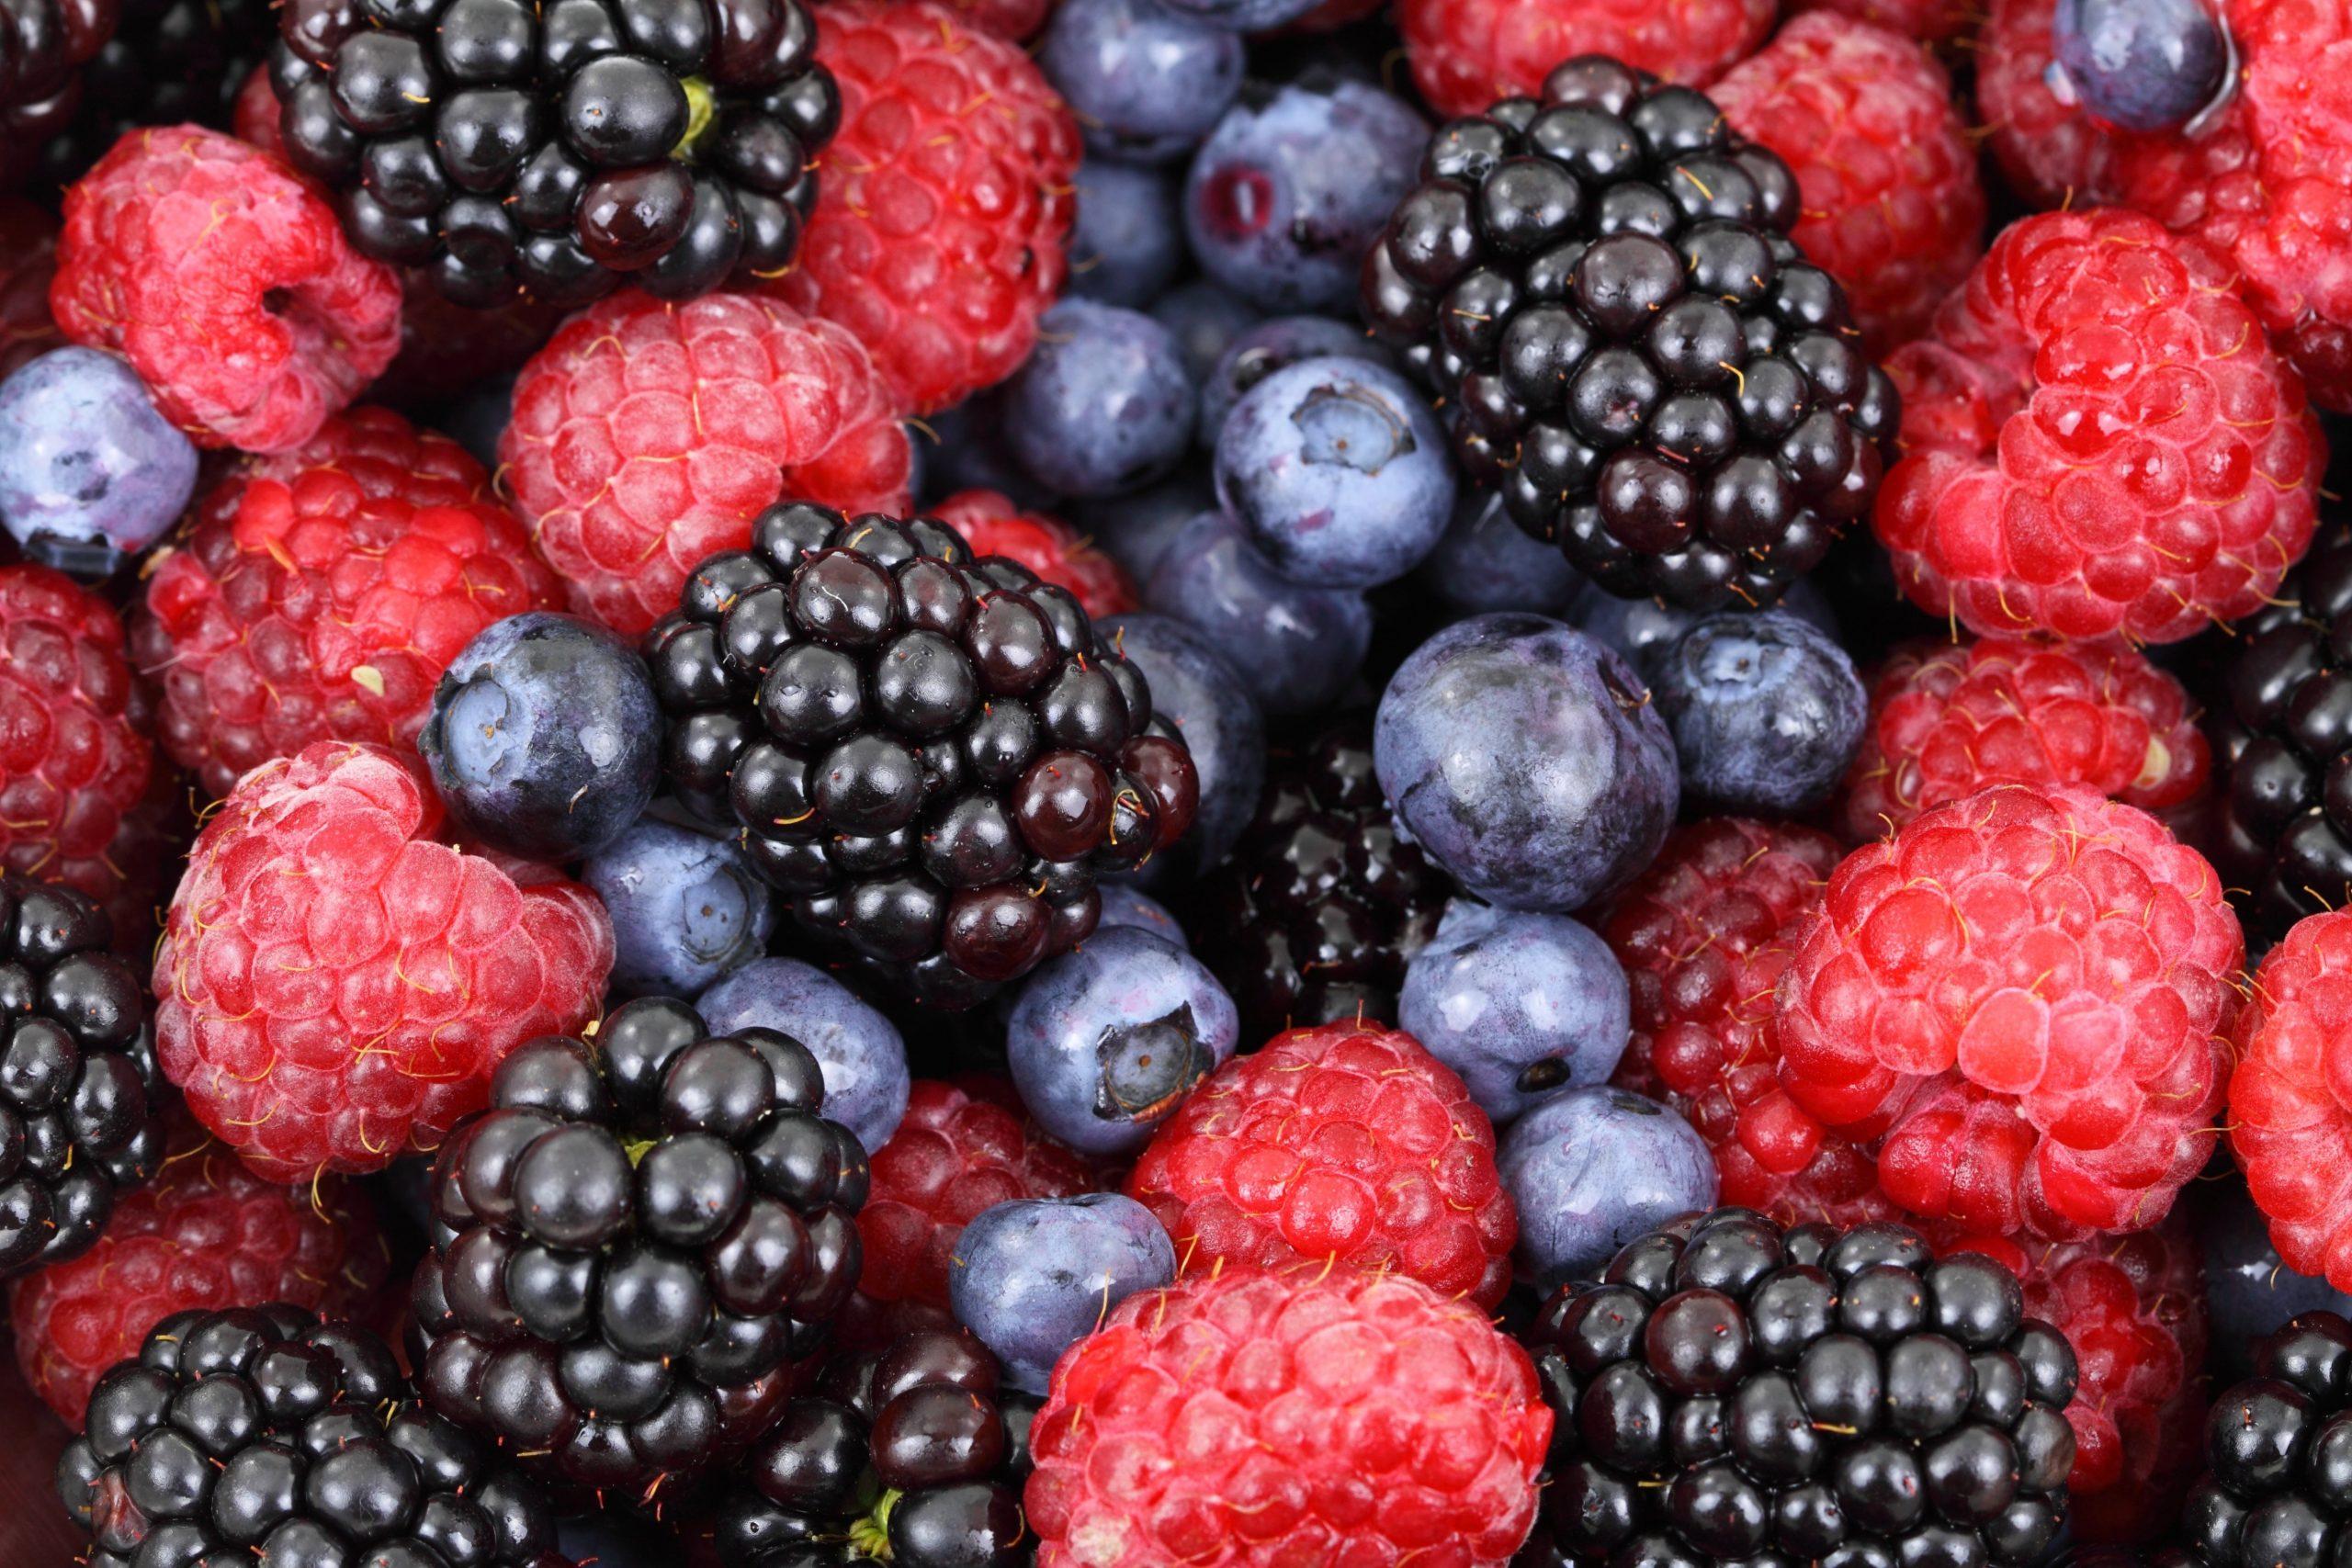 Dietista nutricionista madrid, aprender a comer